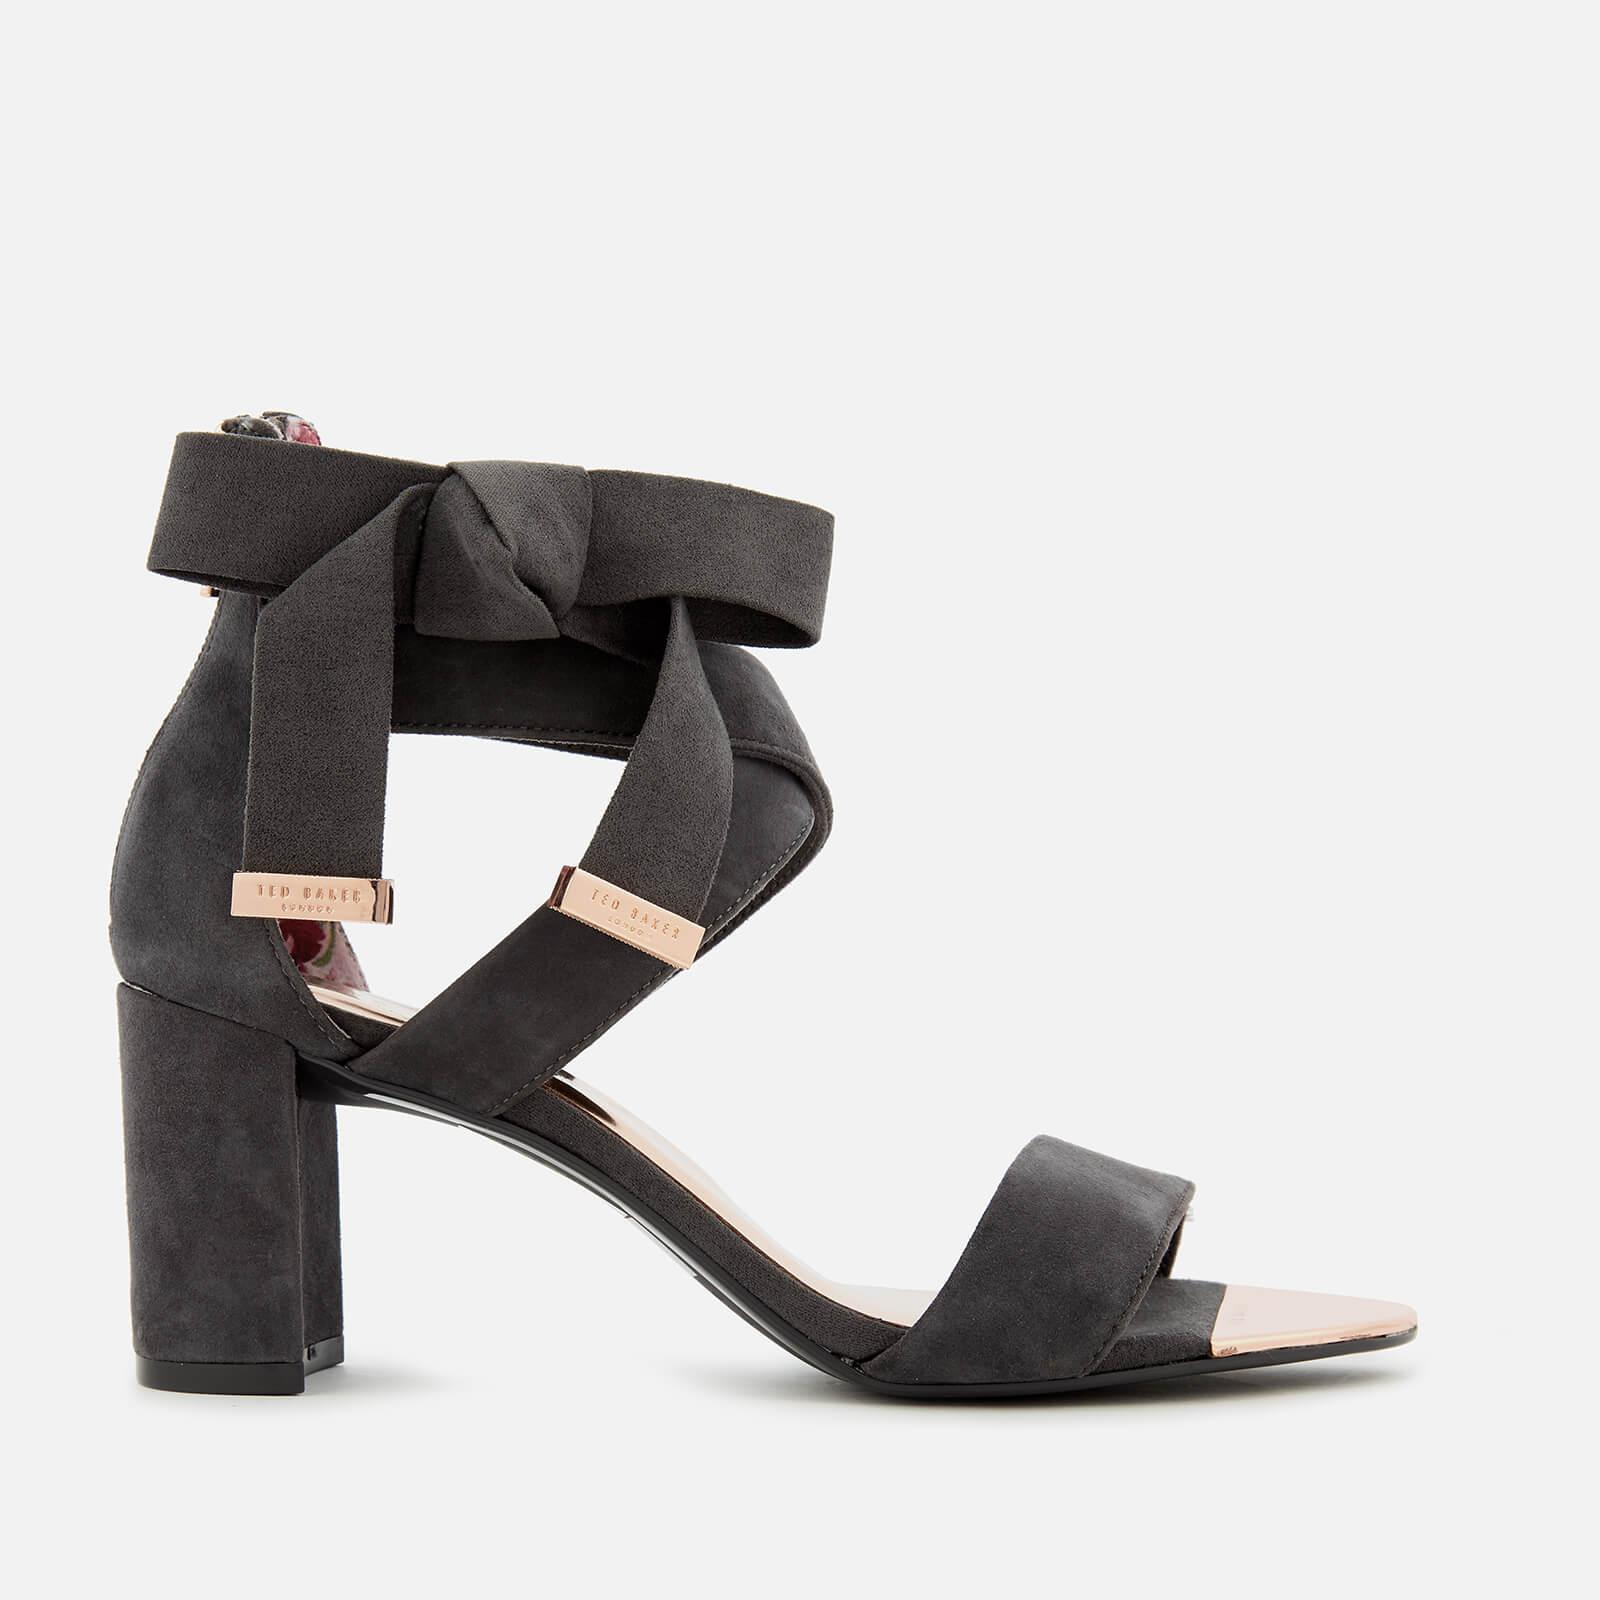 80d0f64c670f9 Lyst - Ted Baker Noxen 2 Suede Block Heeled Sandals in Gray